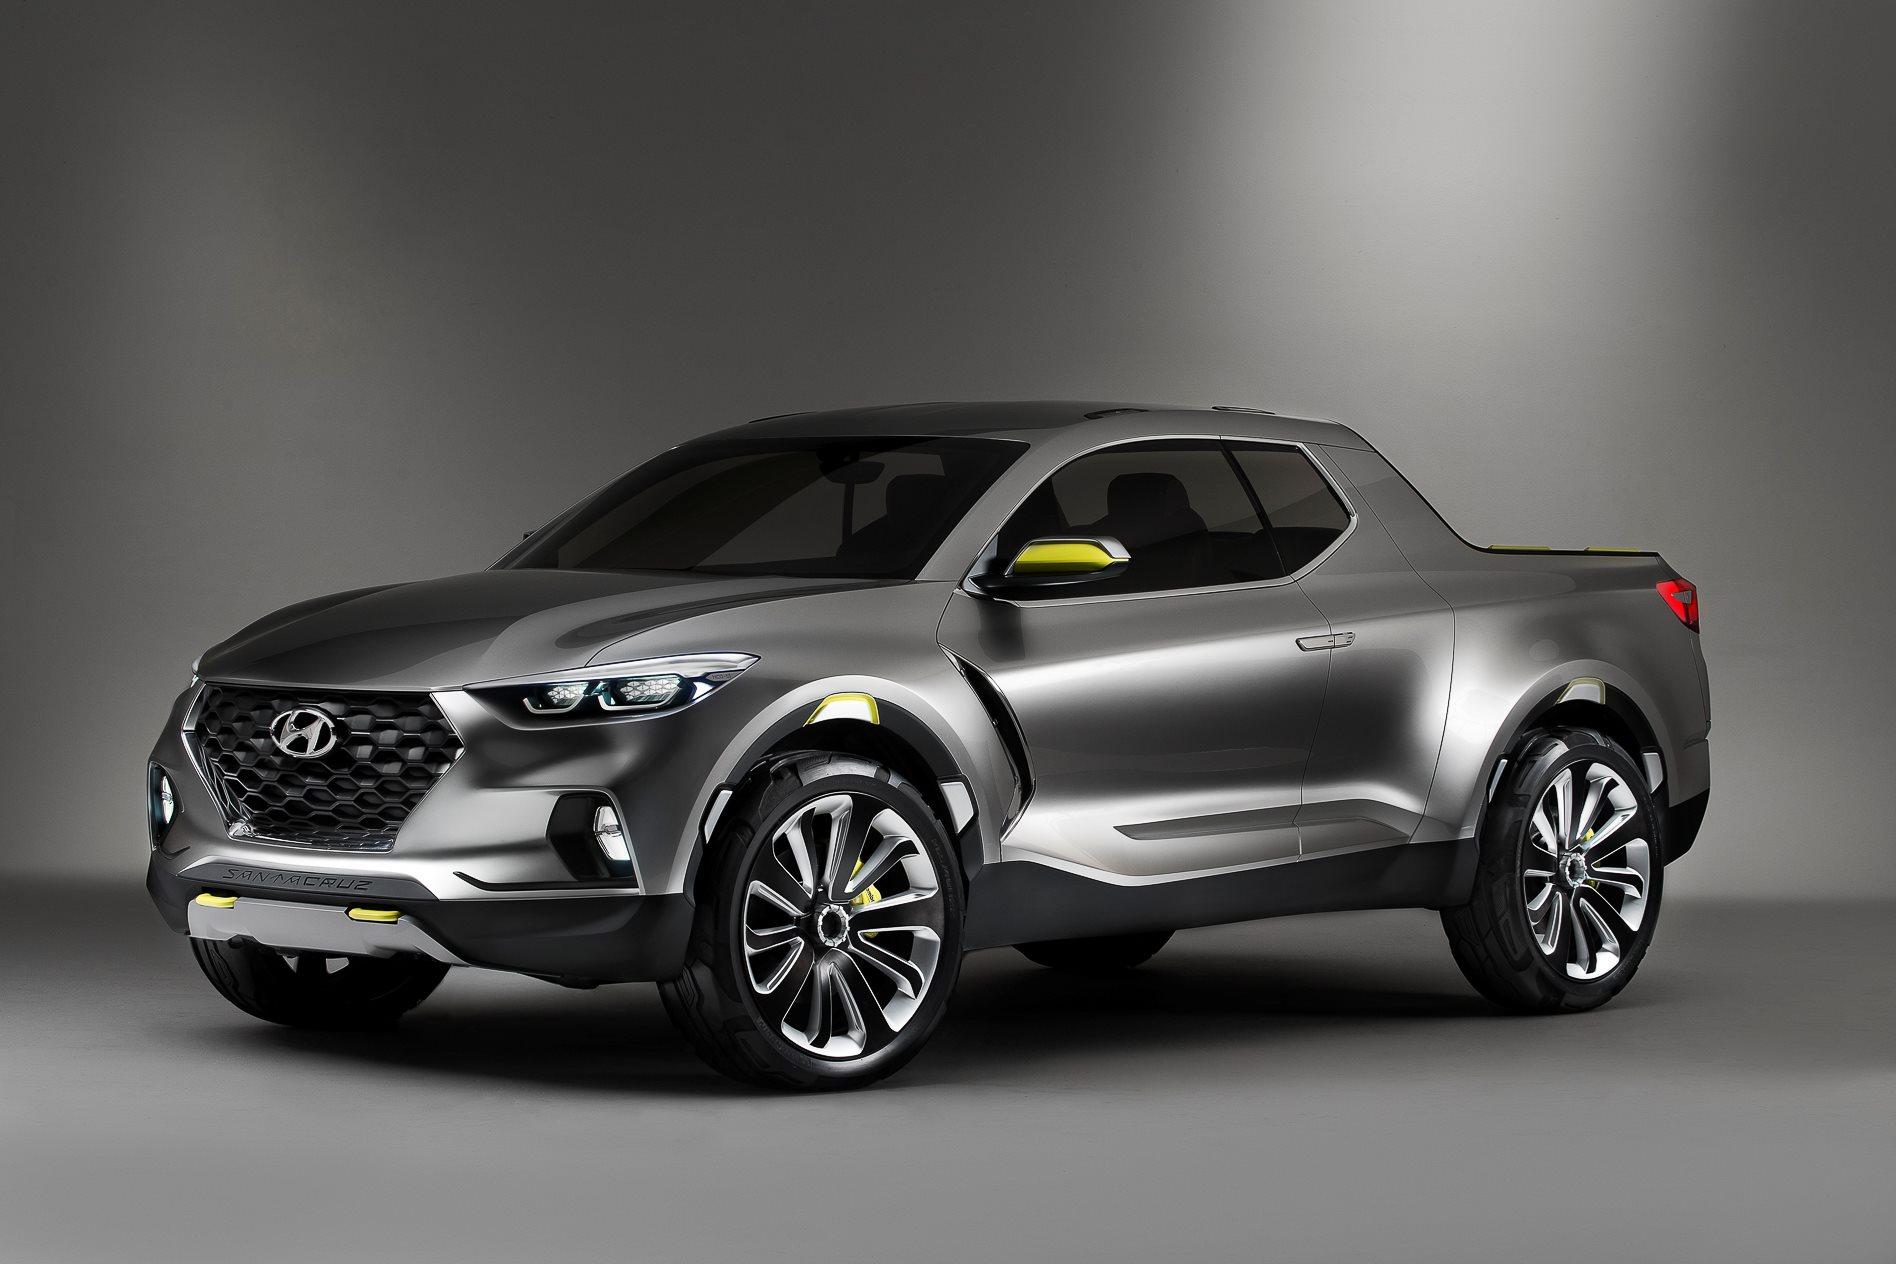 Hyundai Santa Cruz ute confirmed